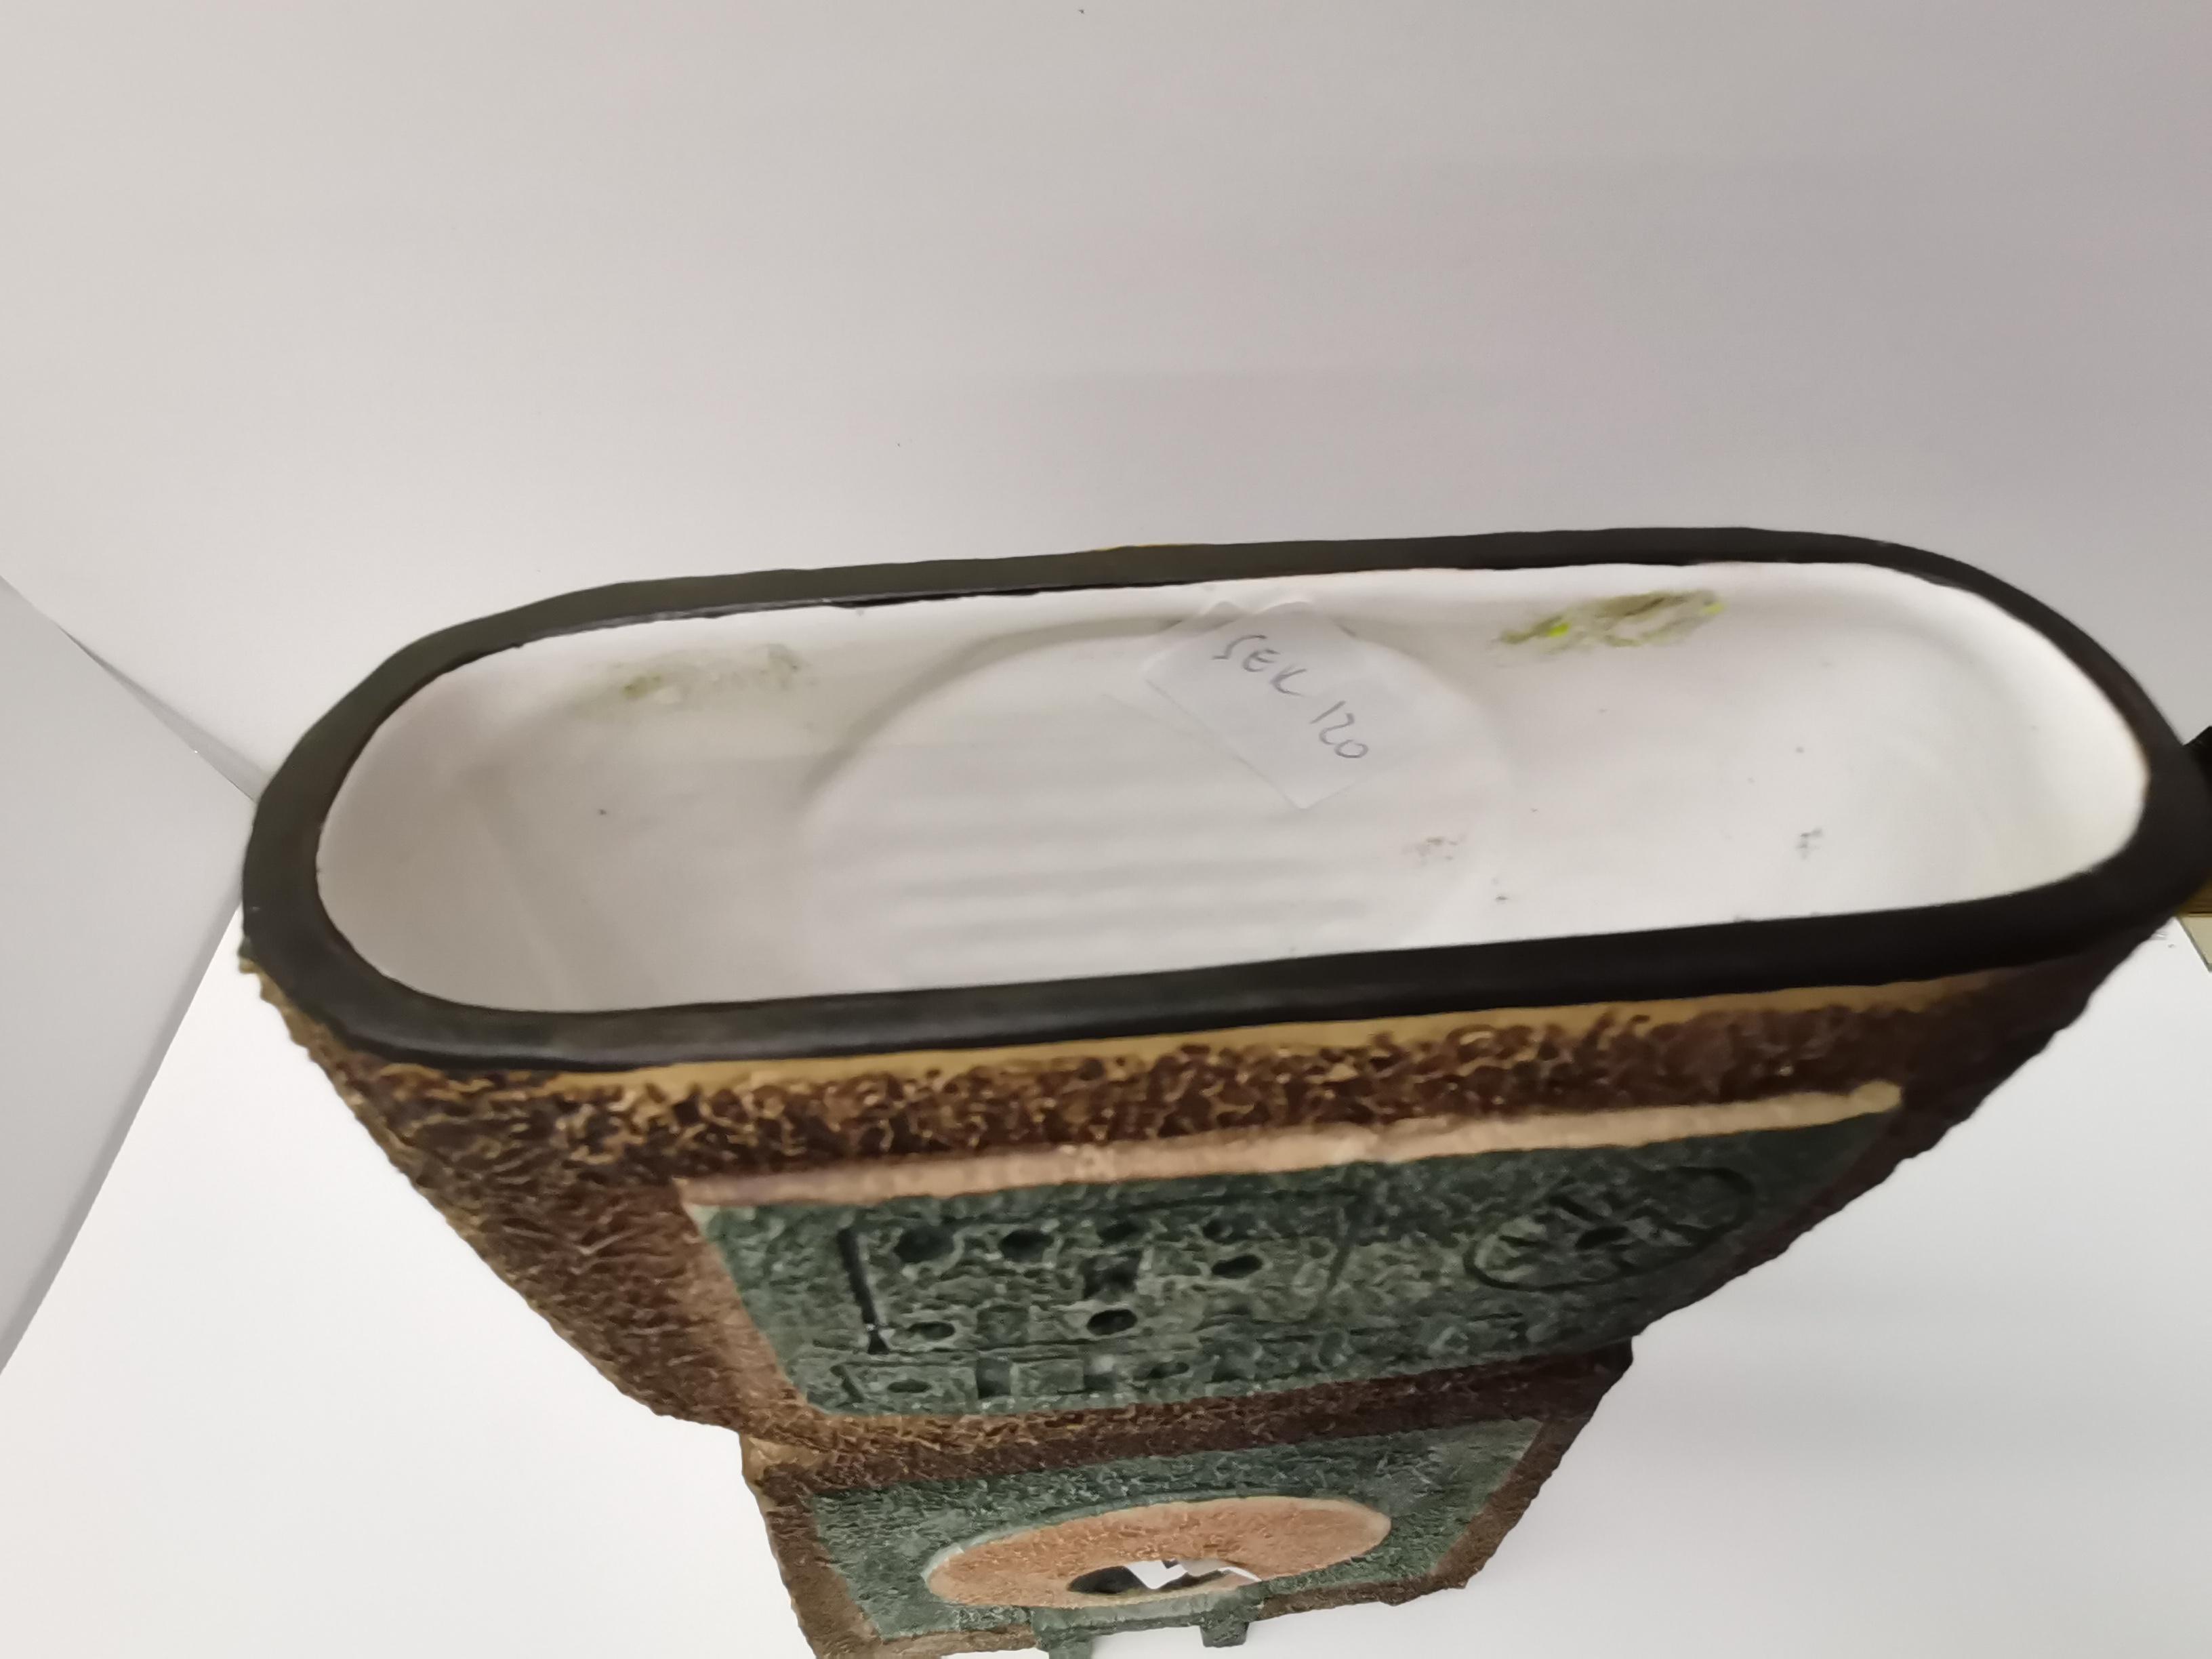 Large Troika double base Vase ex. condition - Image 4 of 4